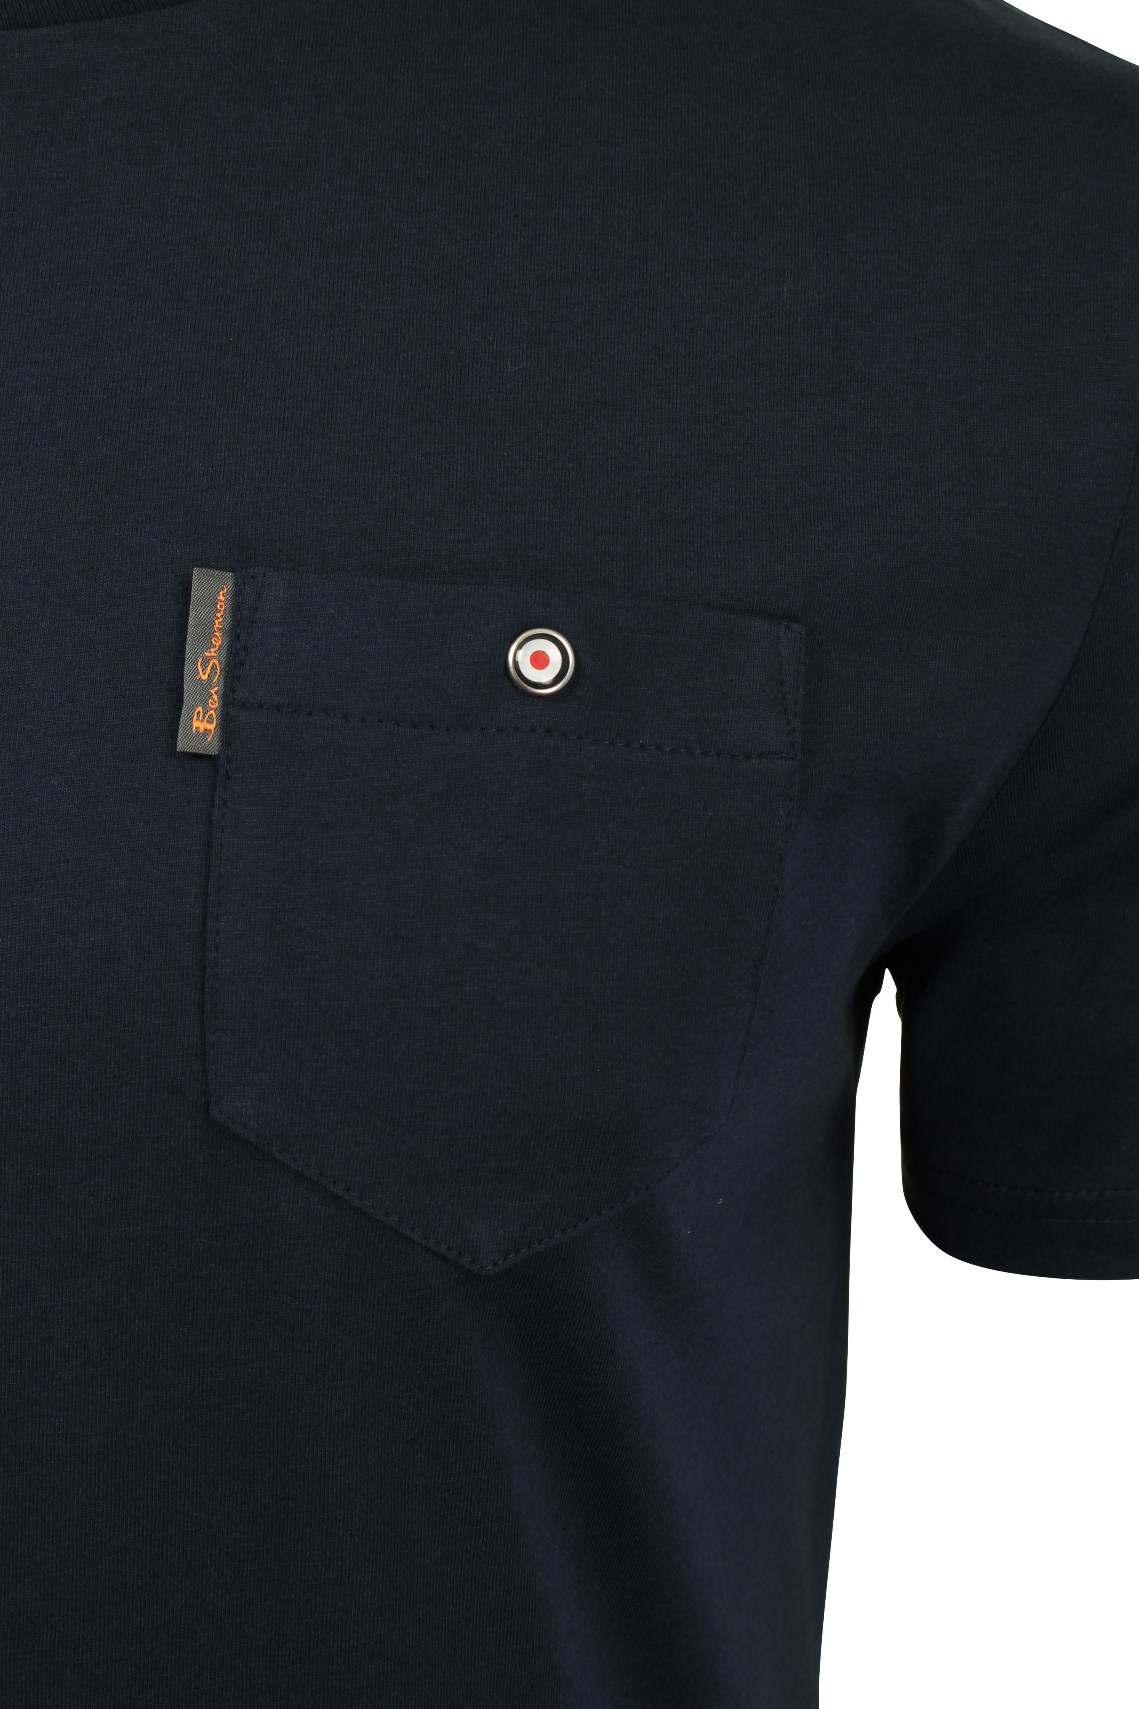 Mens-Classic-Spade-Pocket-T-Shirt-by-Ben-Sherman thumbnail 24